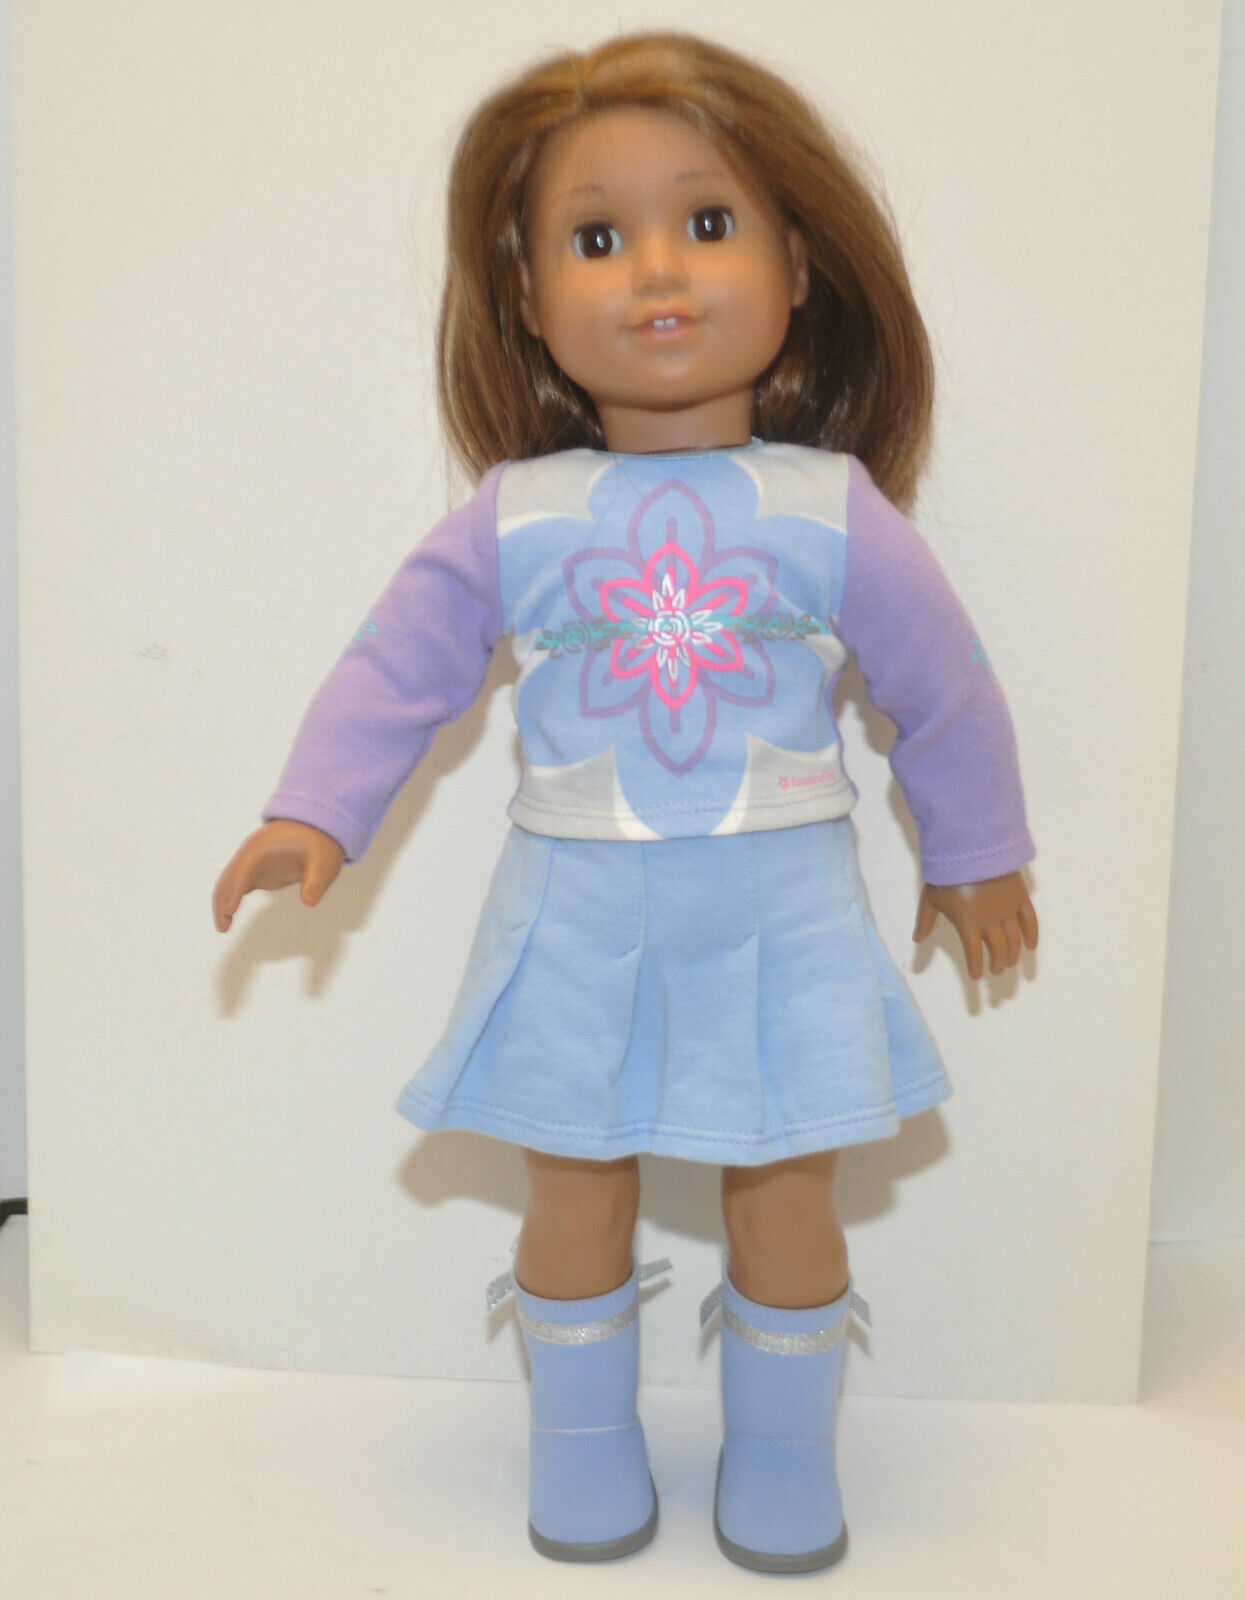 American Girl Doll 2008 Just Like You Truly Me JLY  28 Short braun Hair & Eyes